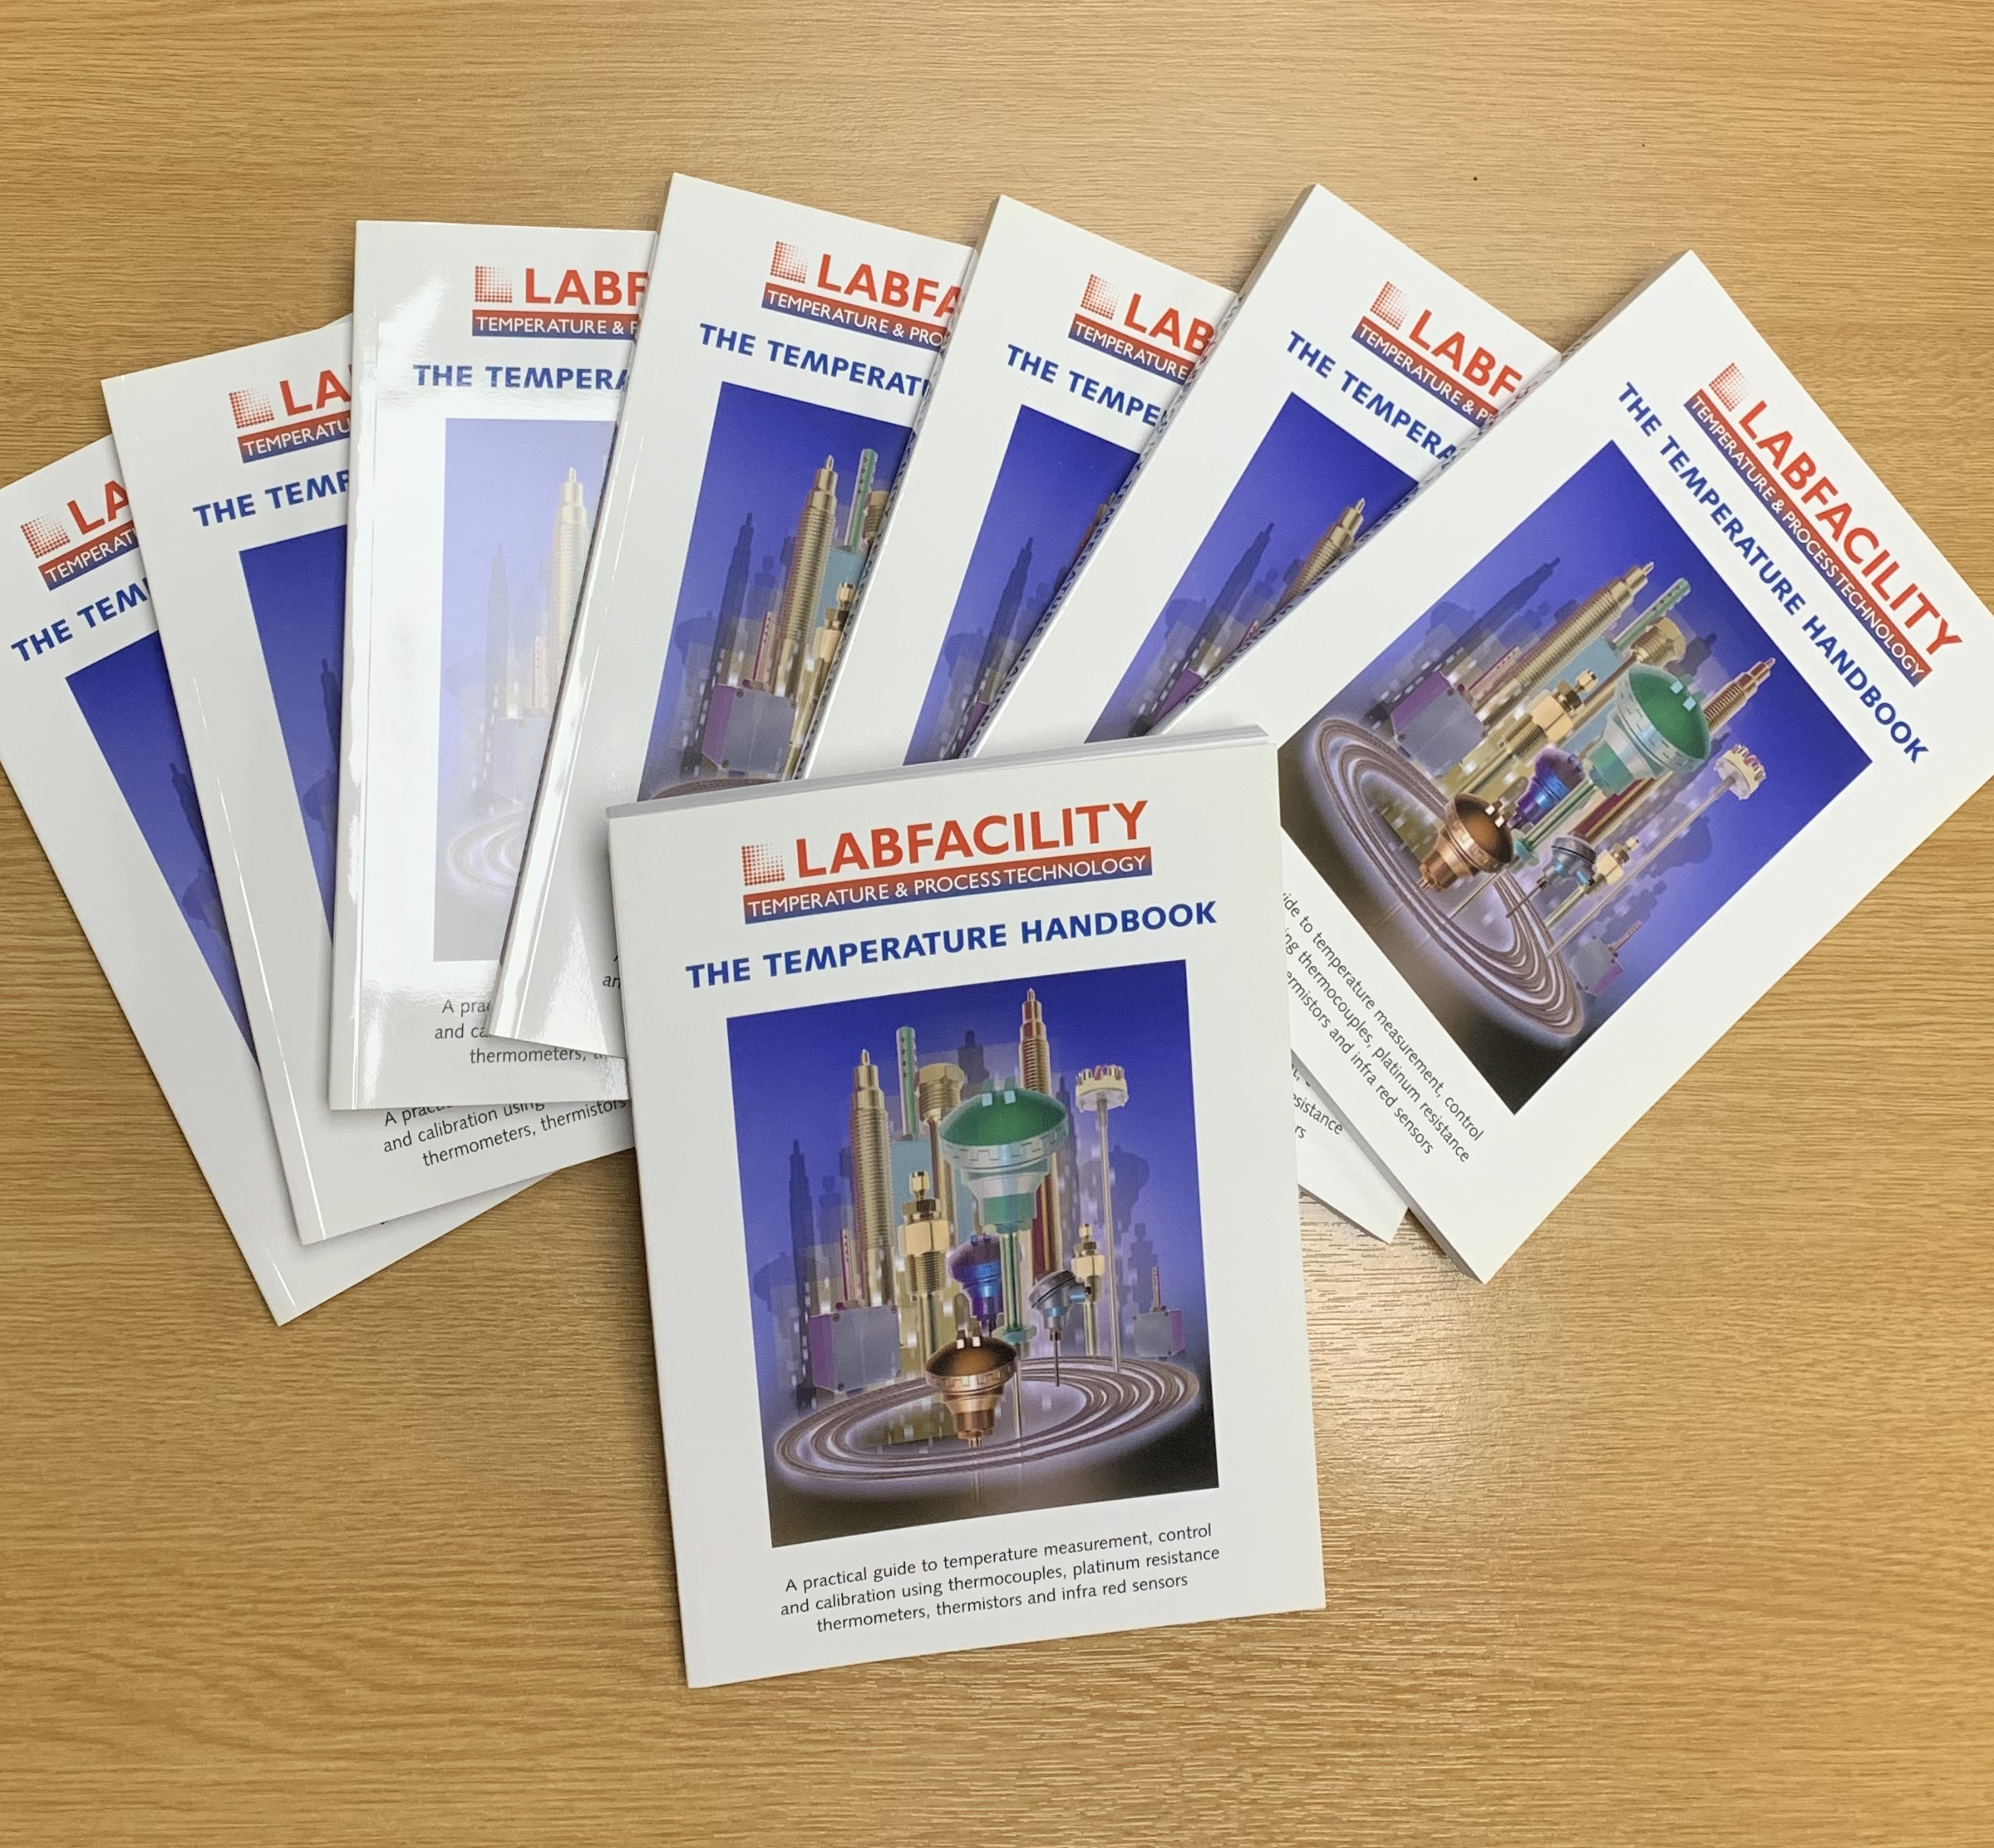 Temperature Handbook - A comprehensive guide to Temperature Measurement